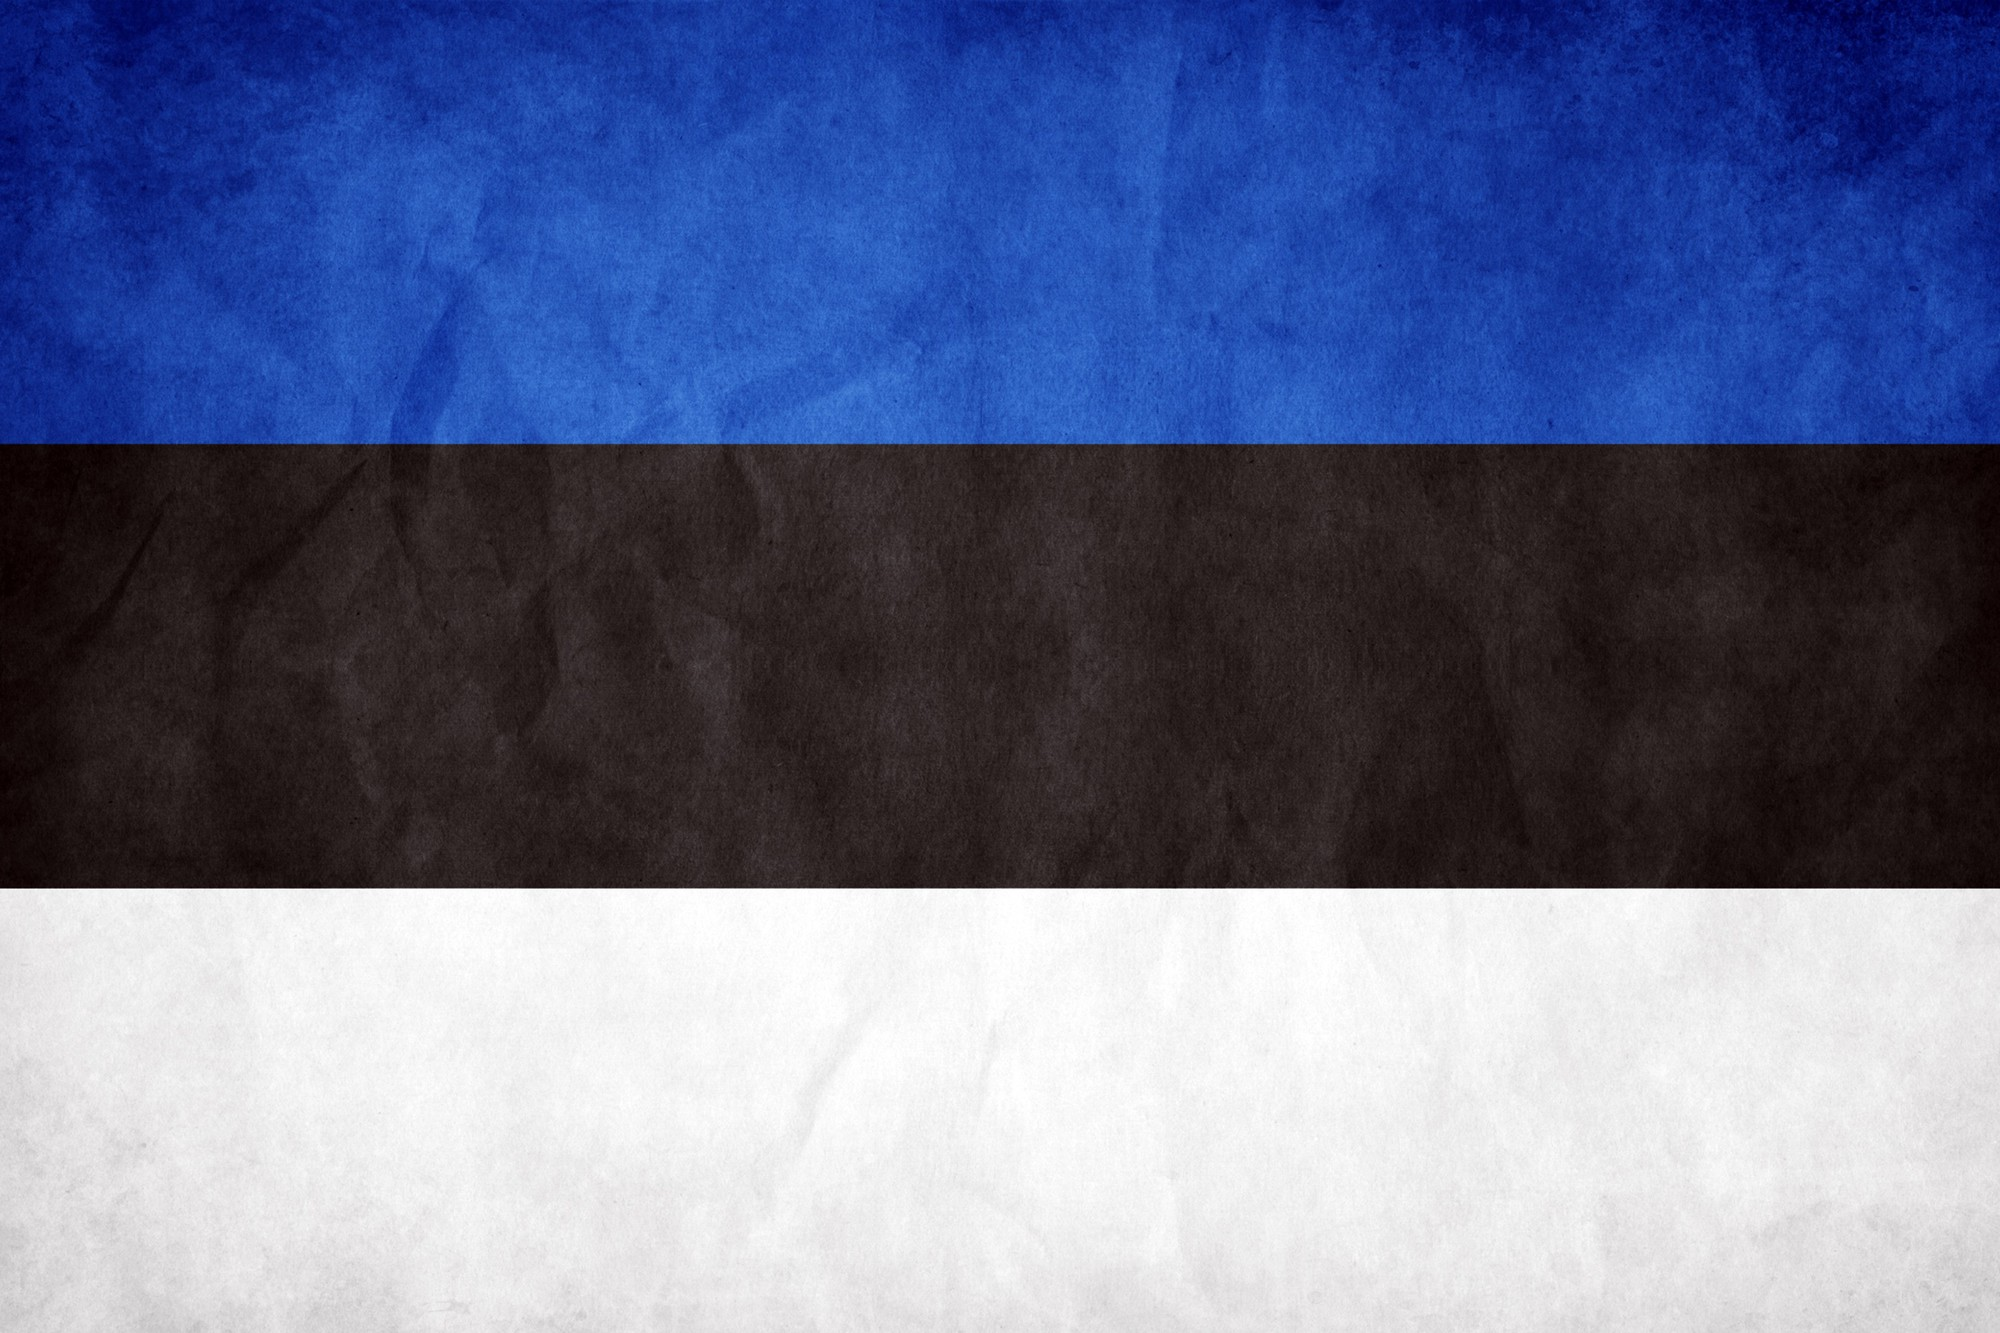 Estonia flag wallpaper 9784 PC en 2000x1333